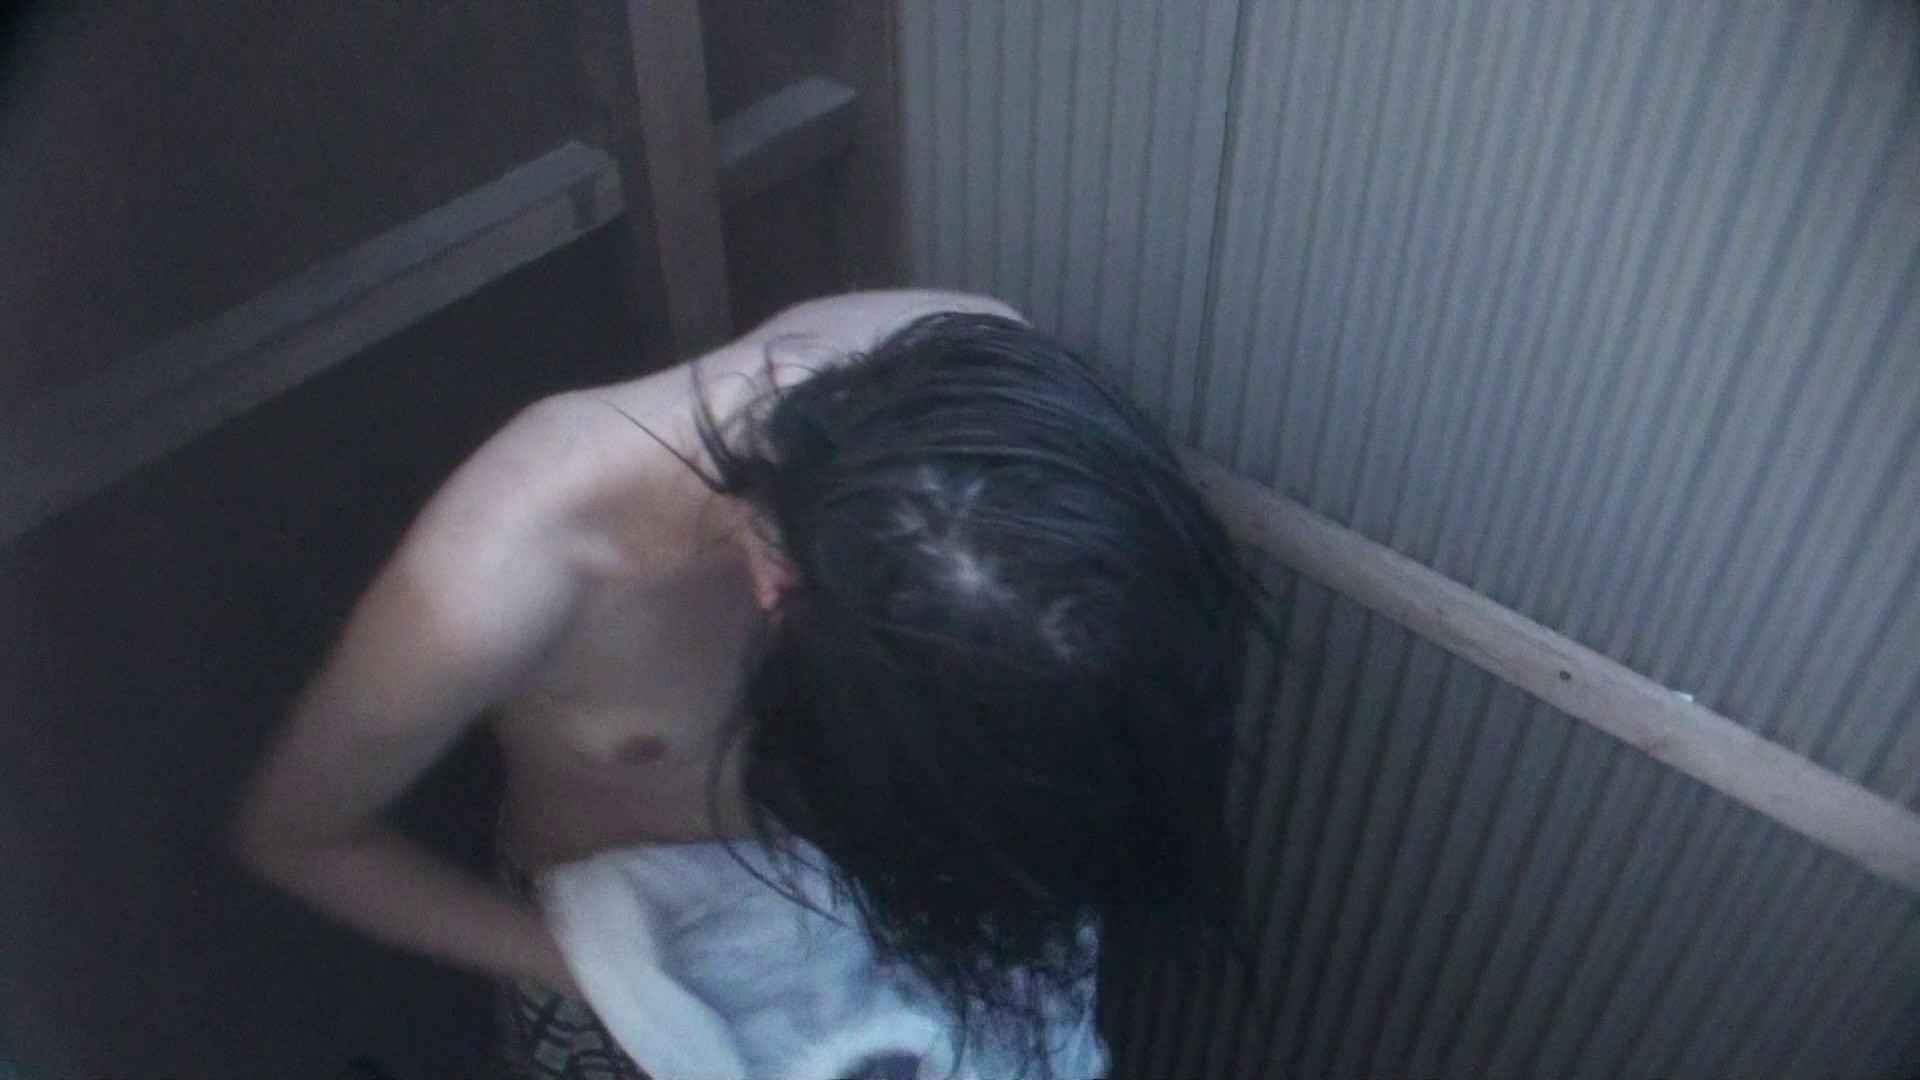 Vol.24 再登場 生理中の年齢不詳嬢 シャワー  28Pix 7